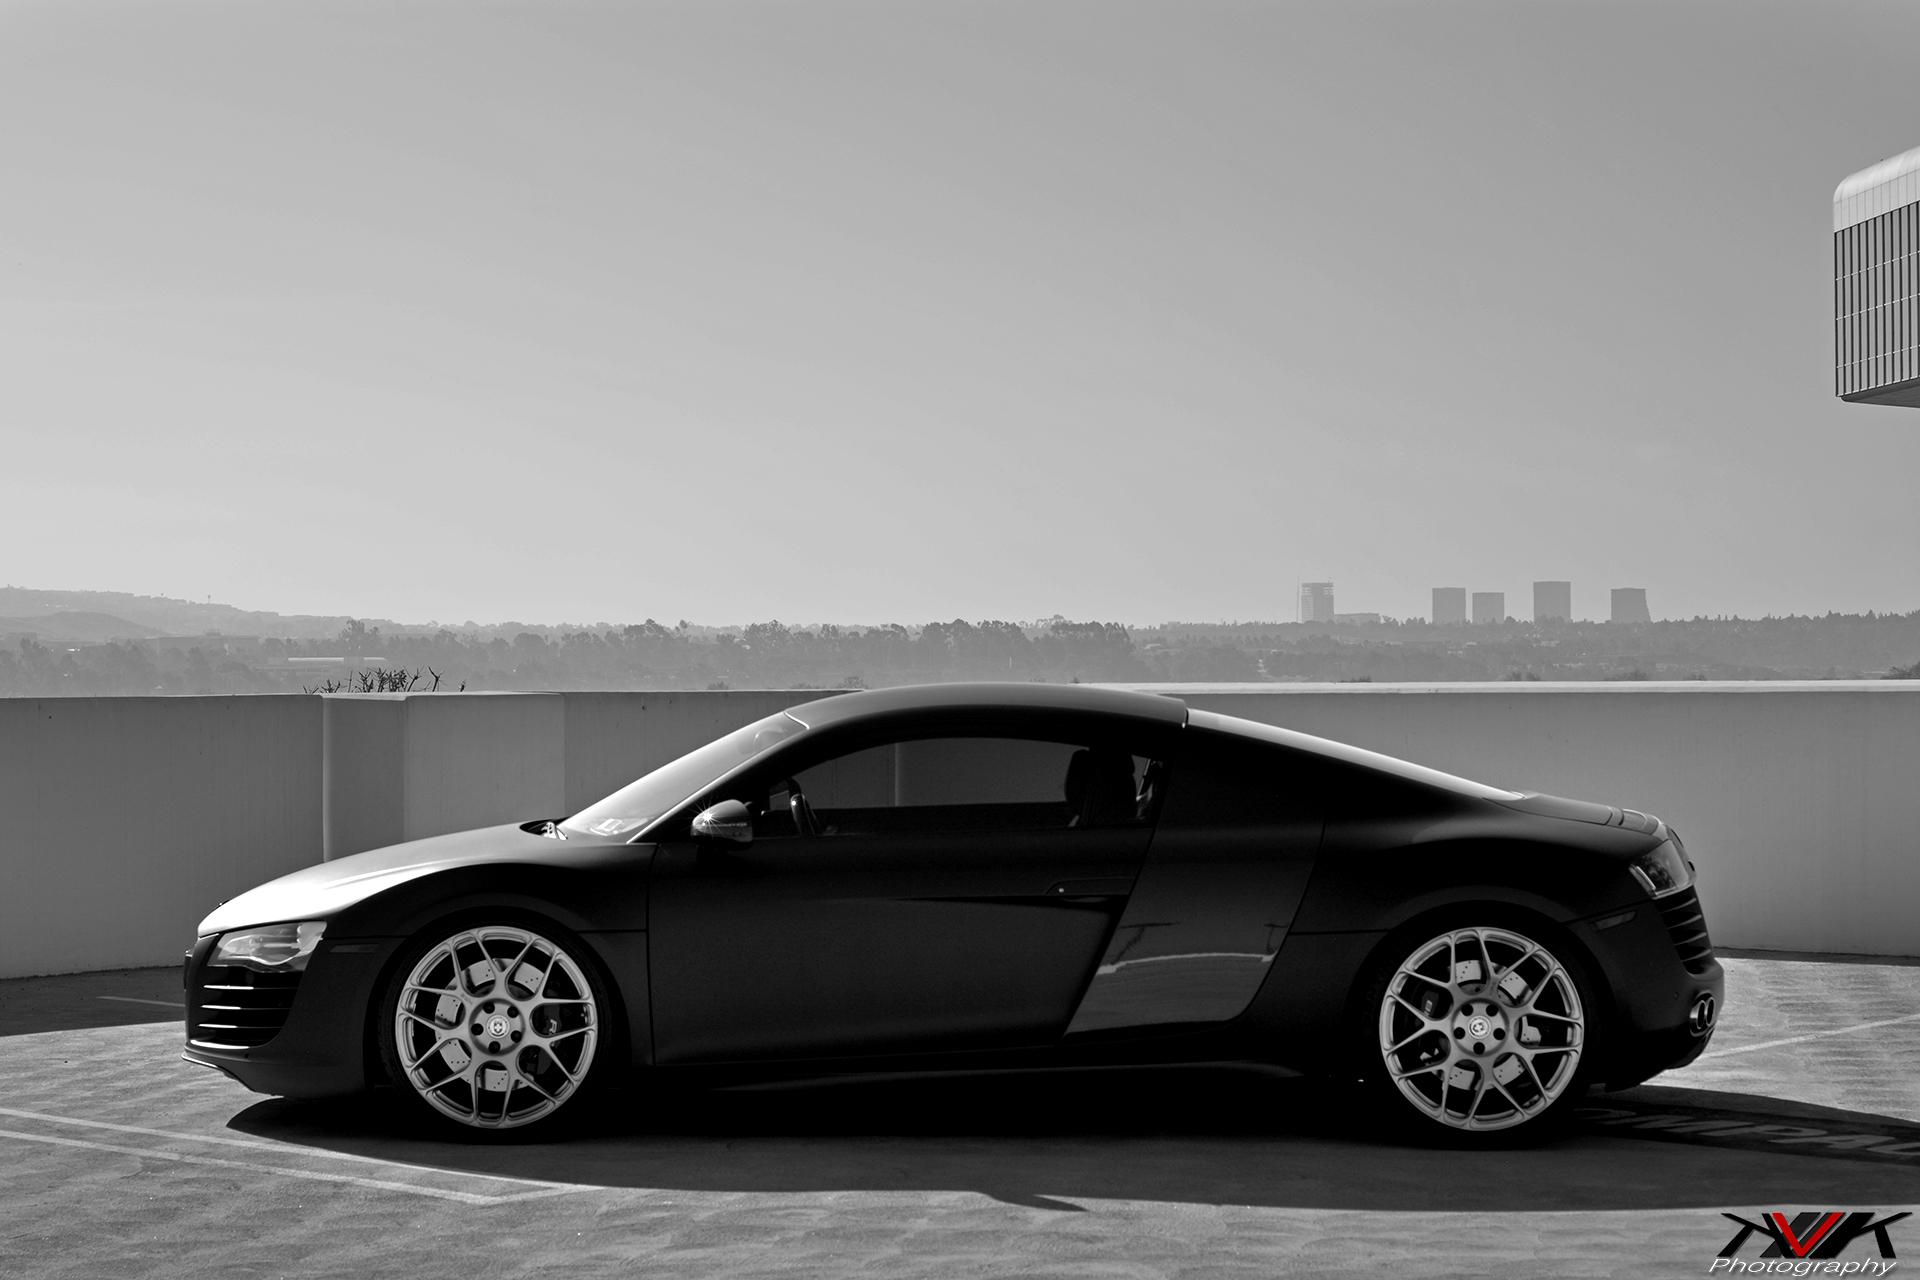 Matte Black Audi R8 On Hre P40sc S By Kvk Photography